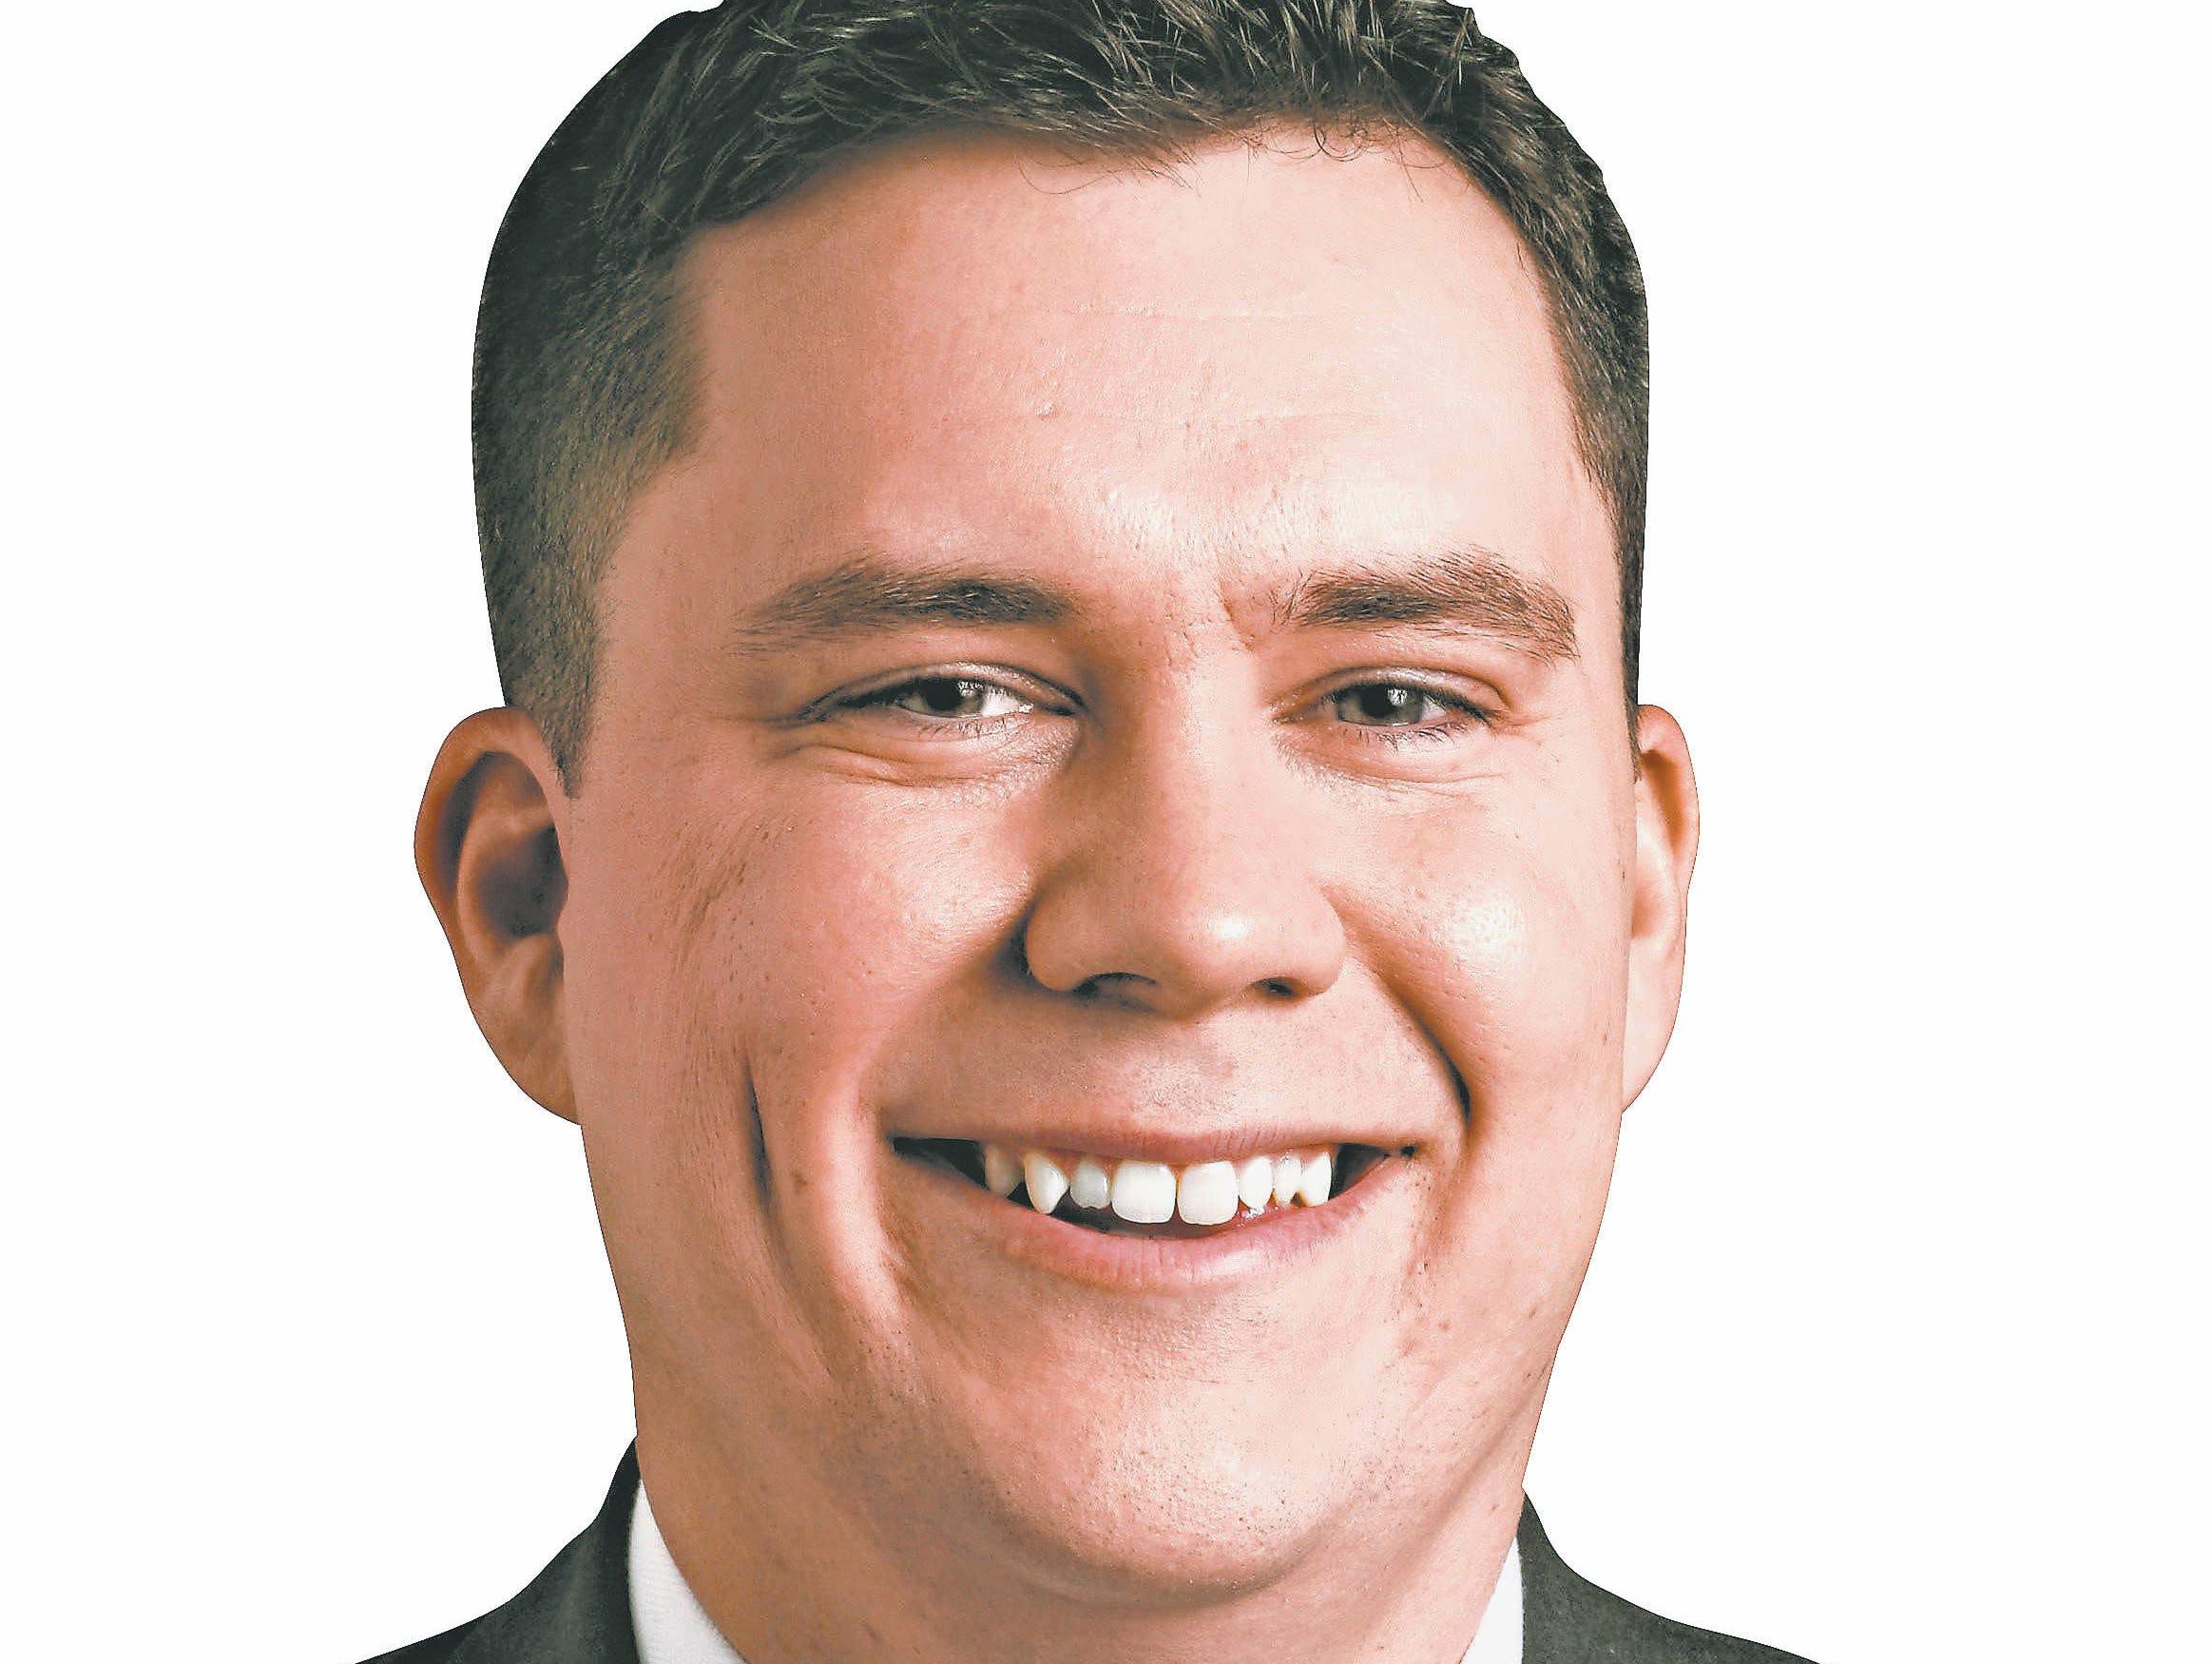 Josh Thomson, Sports reporter.